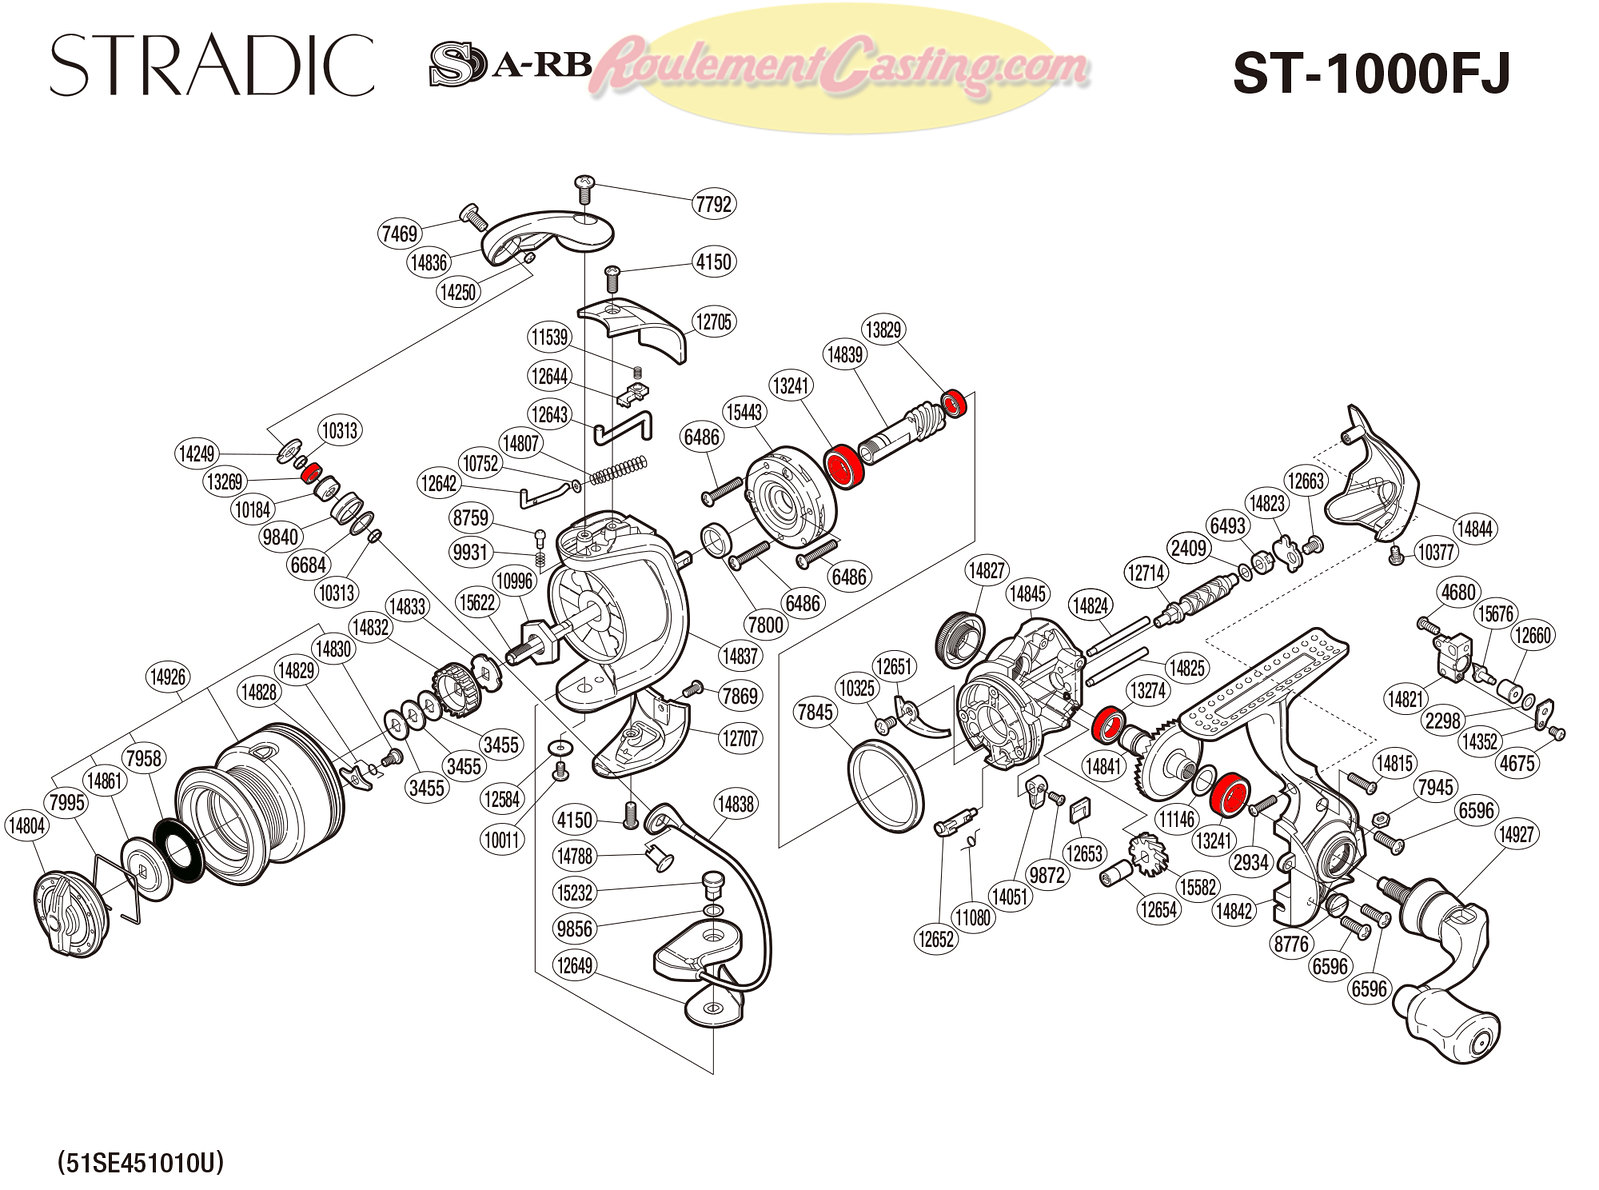 Schema-Stradic-1000FJ